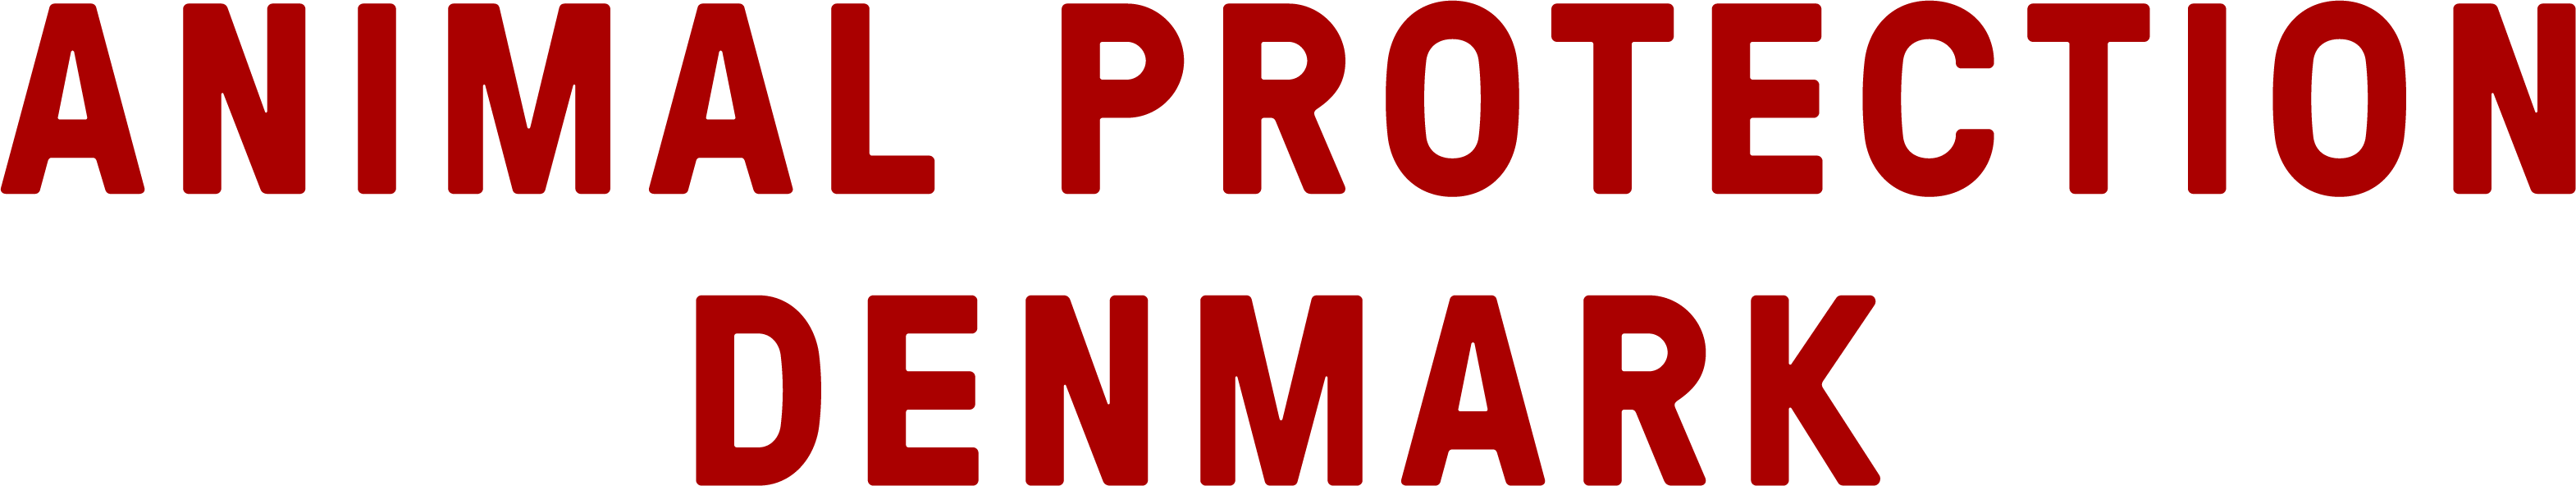 Animal Protection Denmark